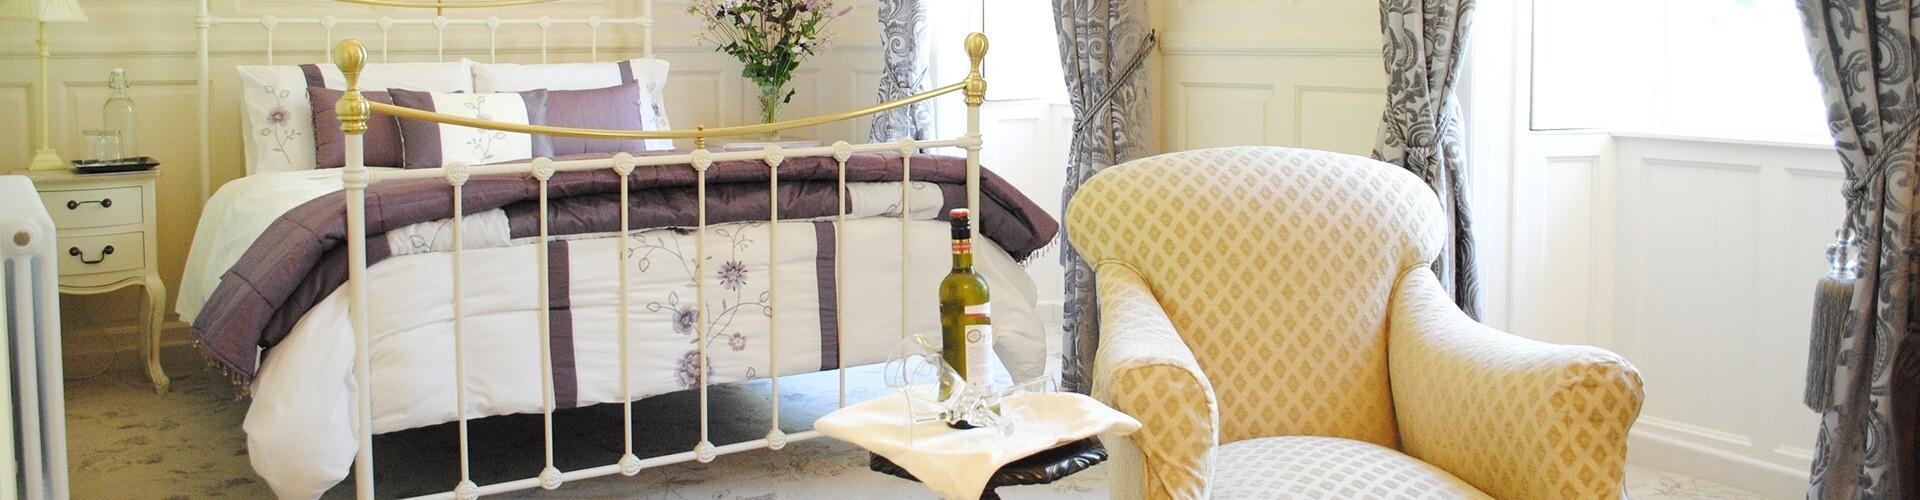 Stylish Bed & Breakfast